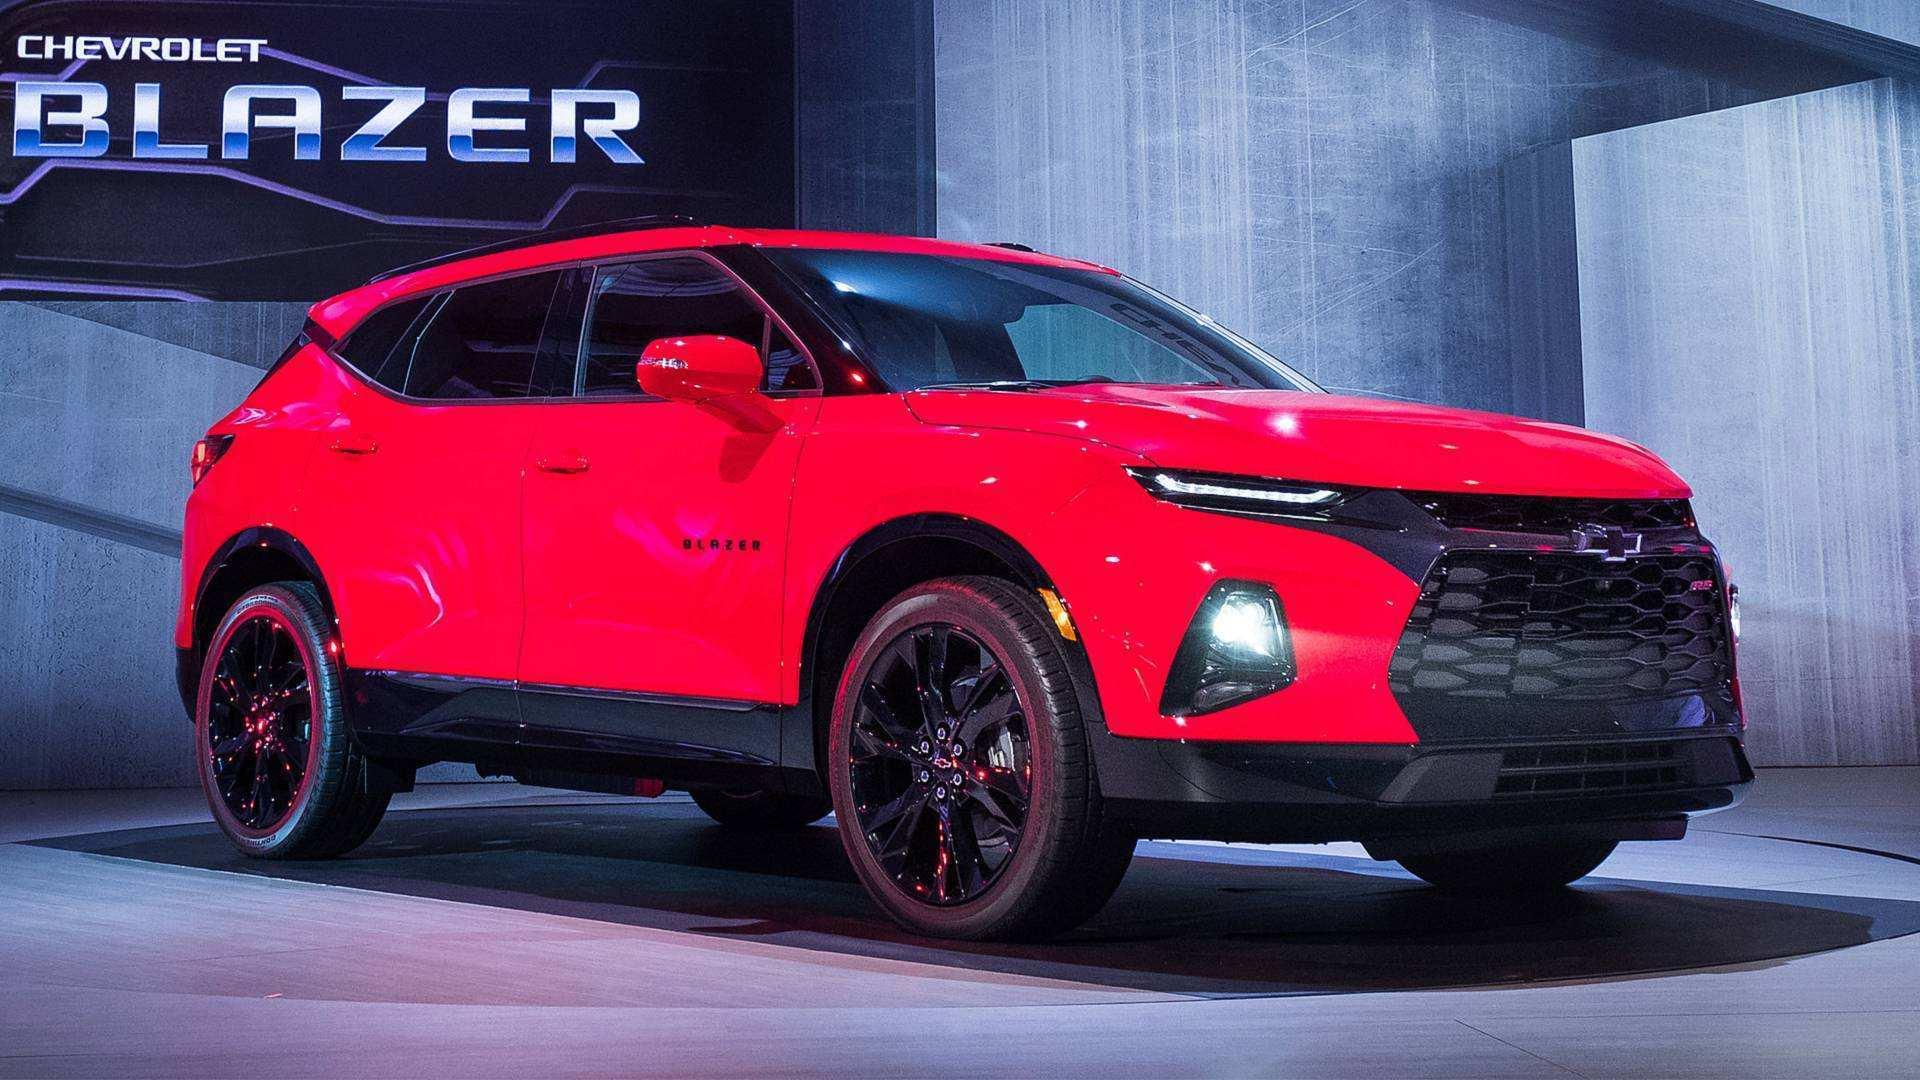 53 New 2020 Chevy Blazer Style for 2020 Chevy Blazer